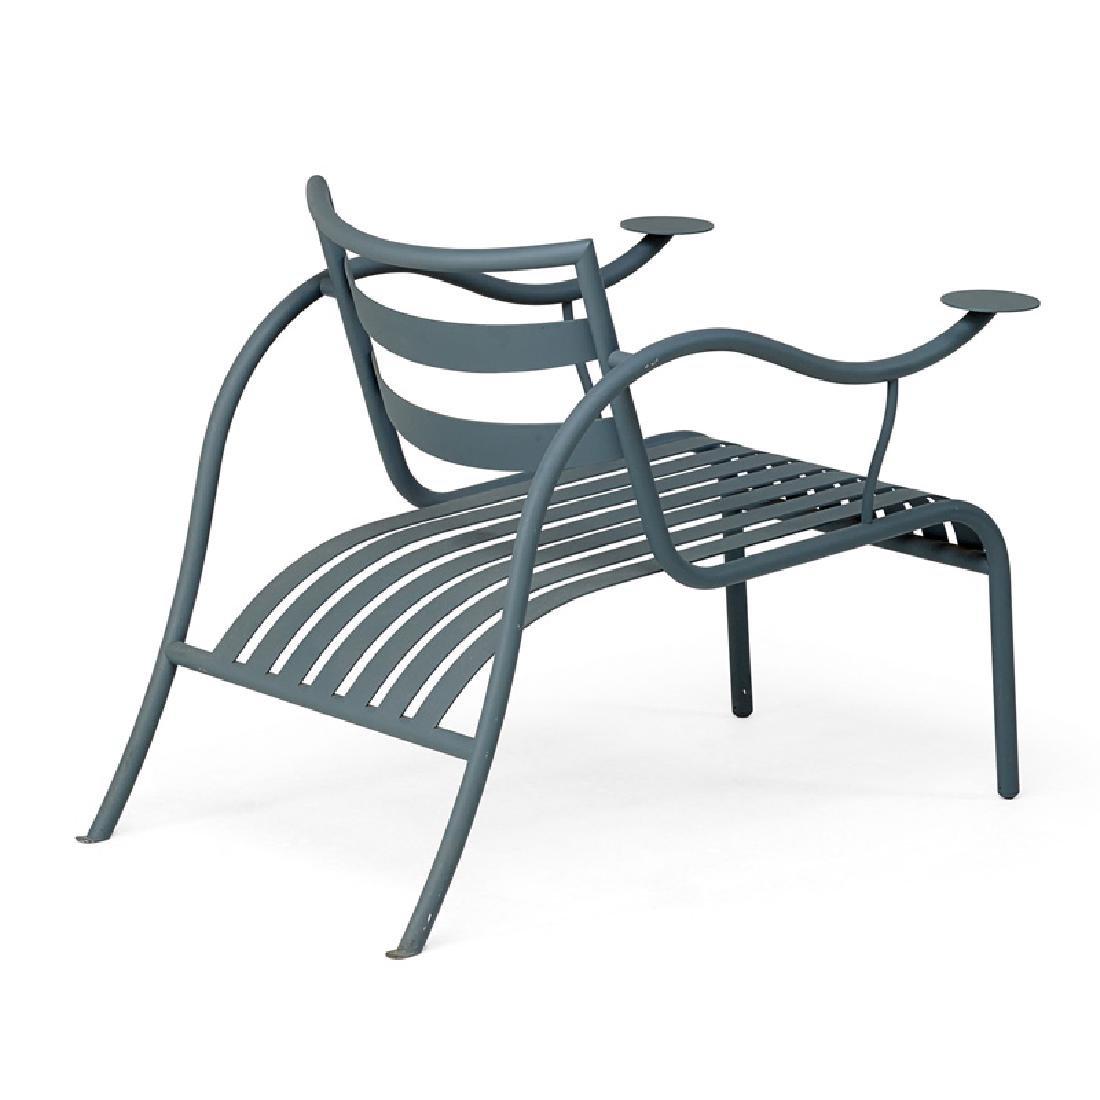 JASPER MORRISON Thinking Man's Chair - 3